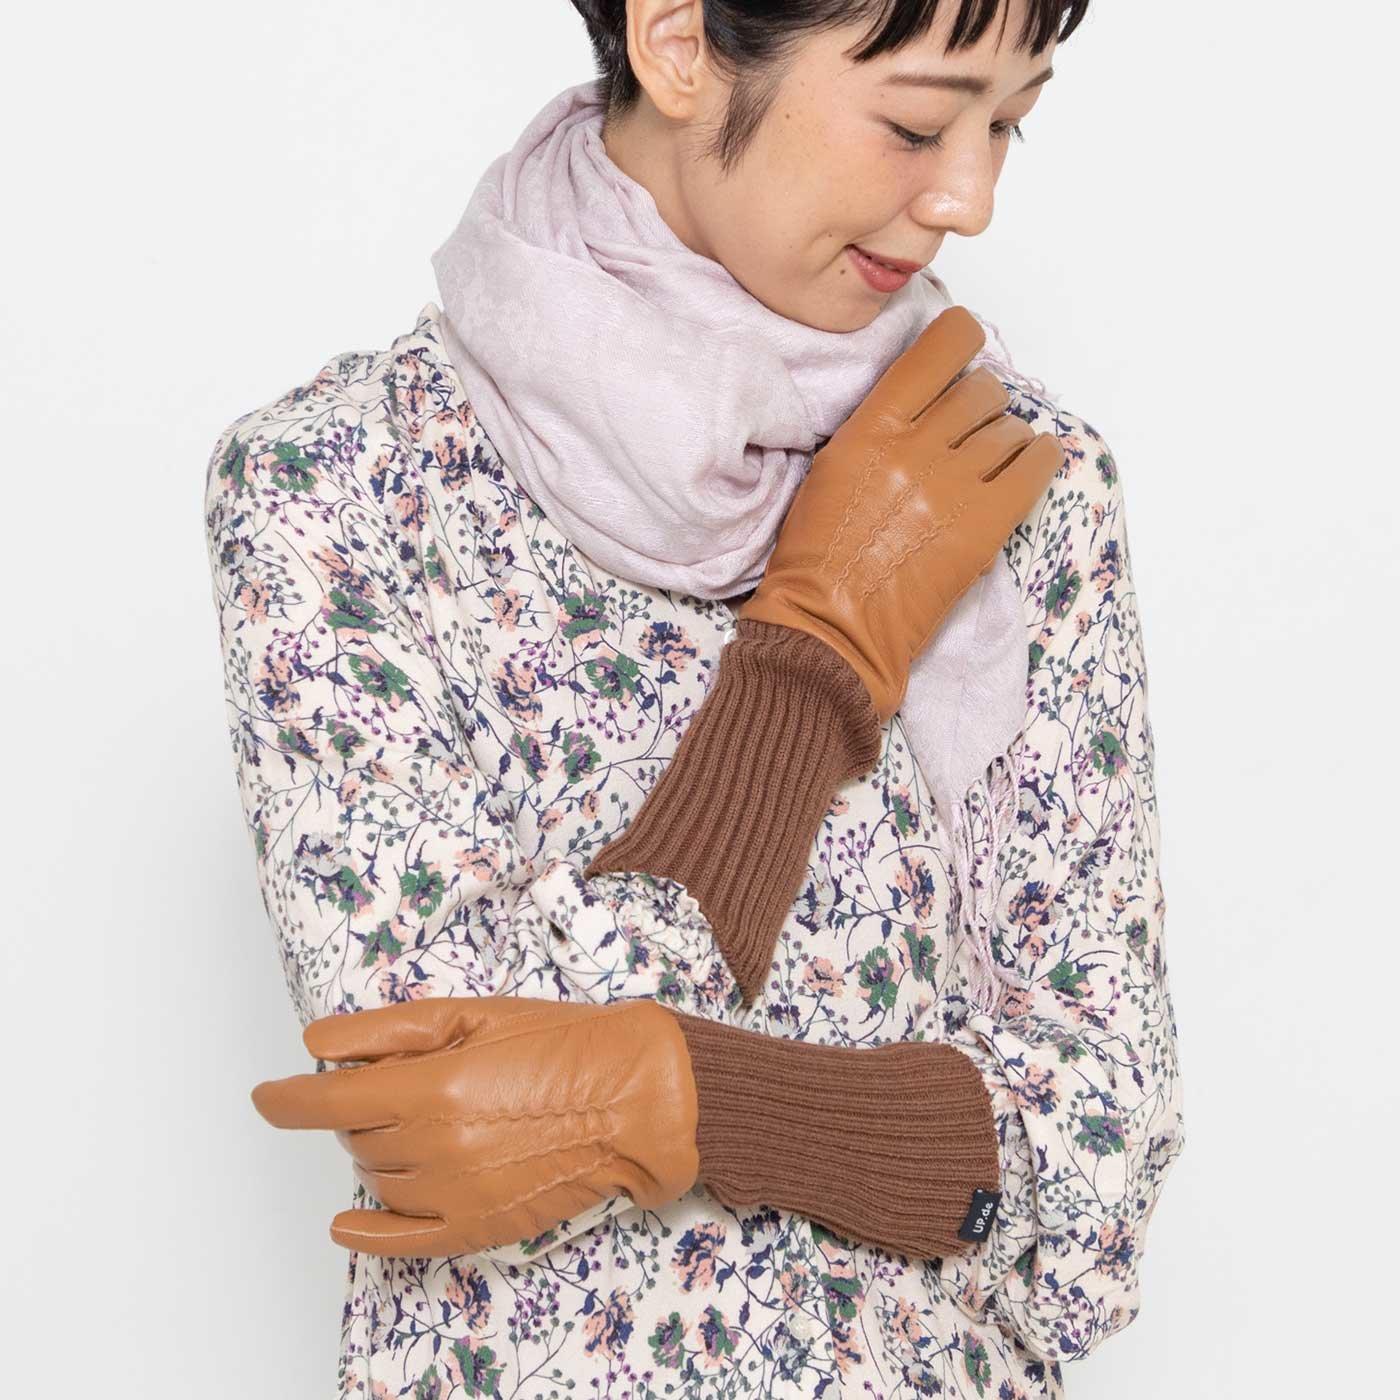 UP.de スマホ操作OK! 使うほどになじむ本革×ニットの暖か仕立てロング手袋〈キャメルベージュ〉